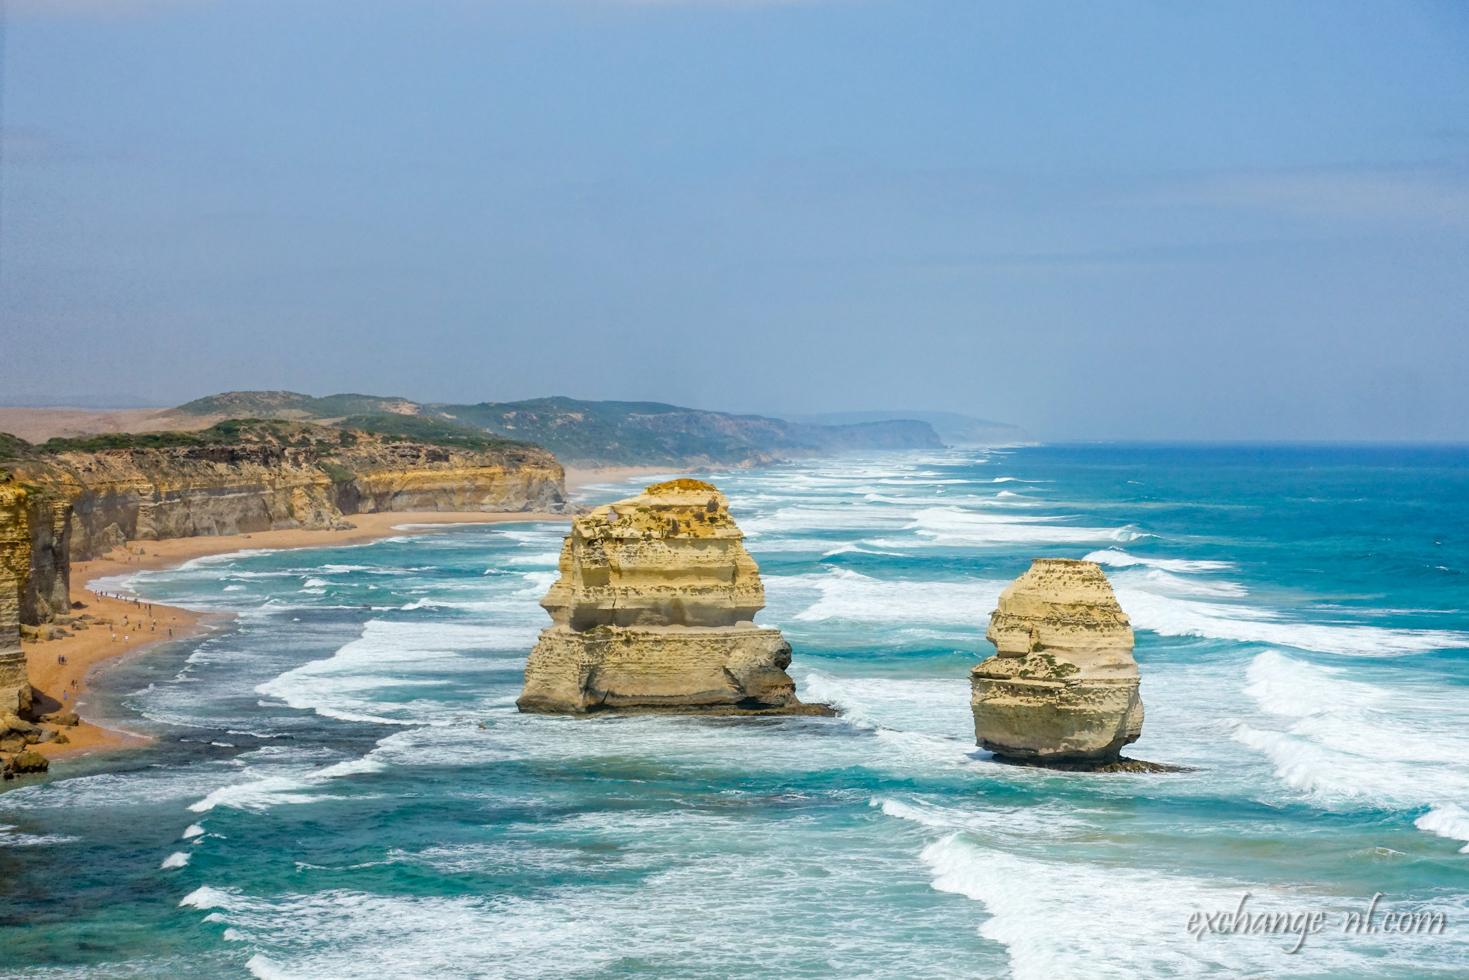 大洋路十二門徒石 Great Ocean Road Twelve Apostles